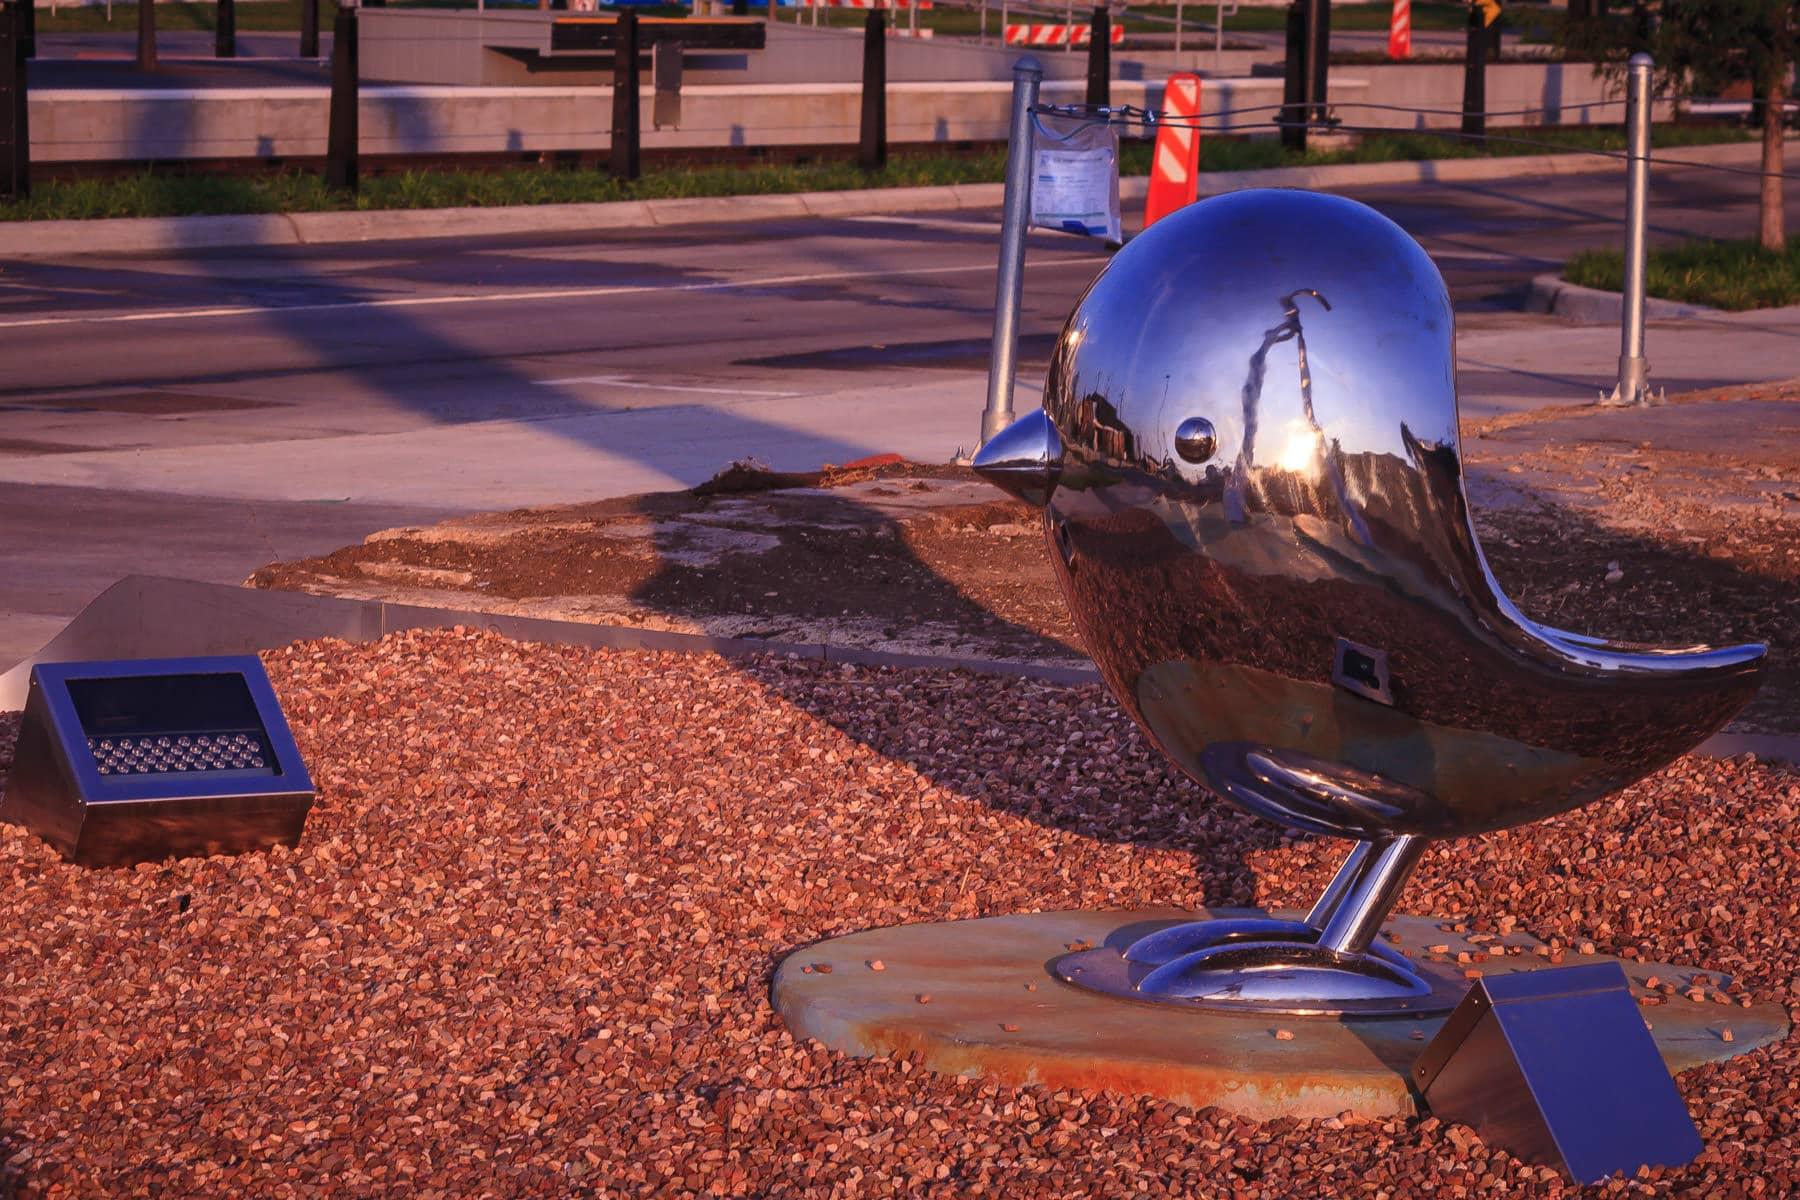 Dallas' Deep Ellum sculpture Traveling Man, is reflected in a companion bird.